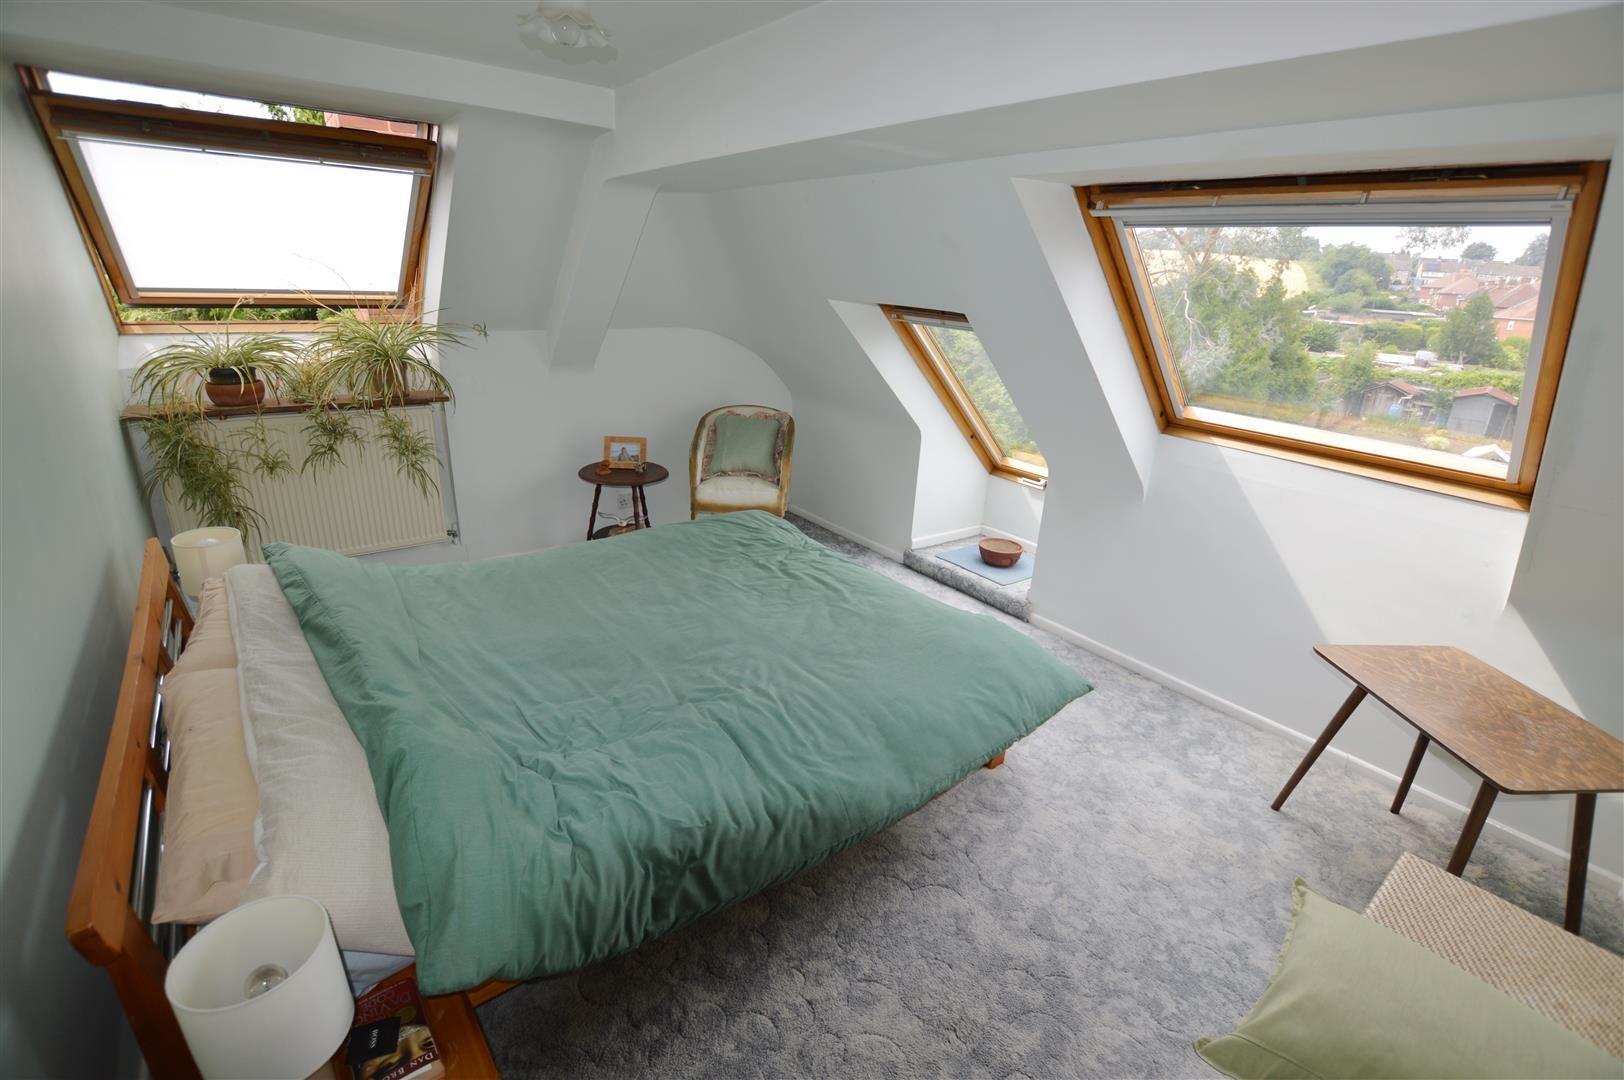 6 bed detached for sale in Leominster 8